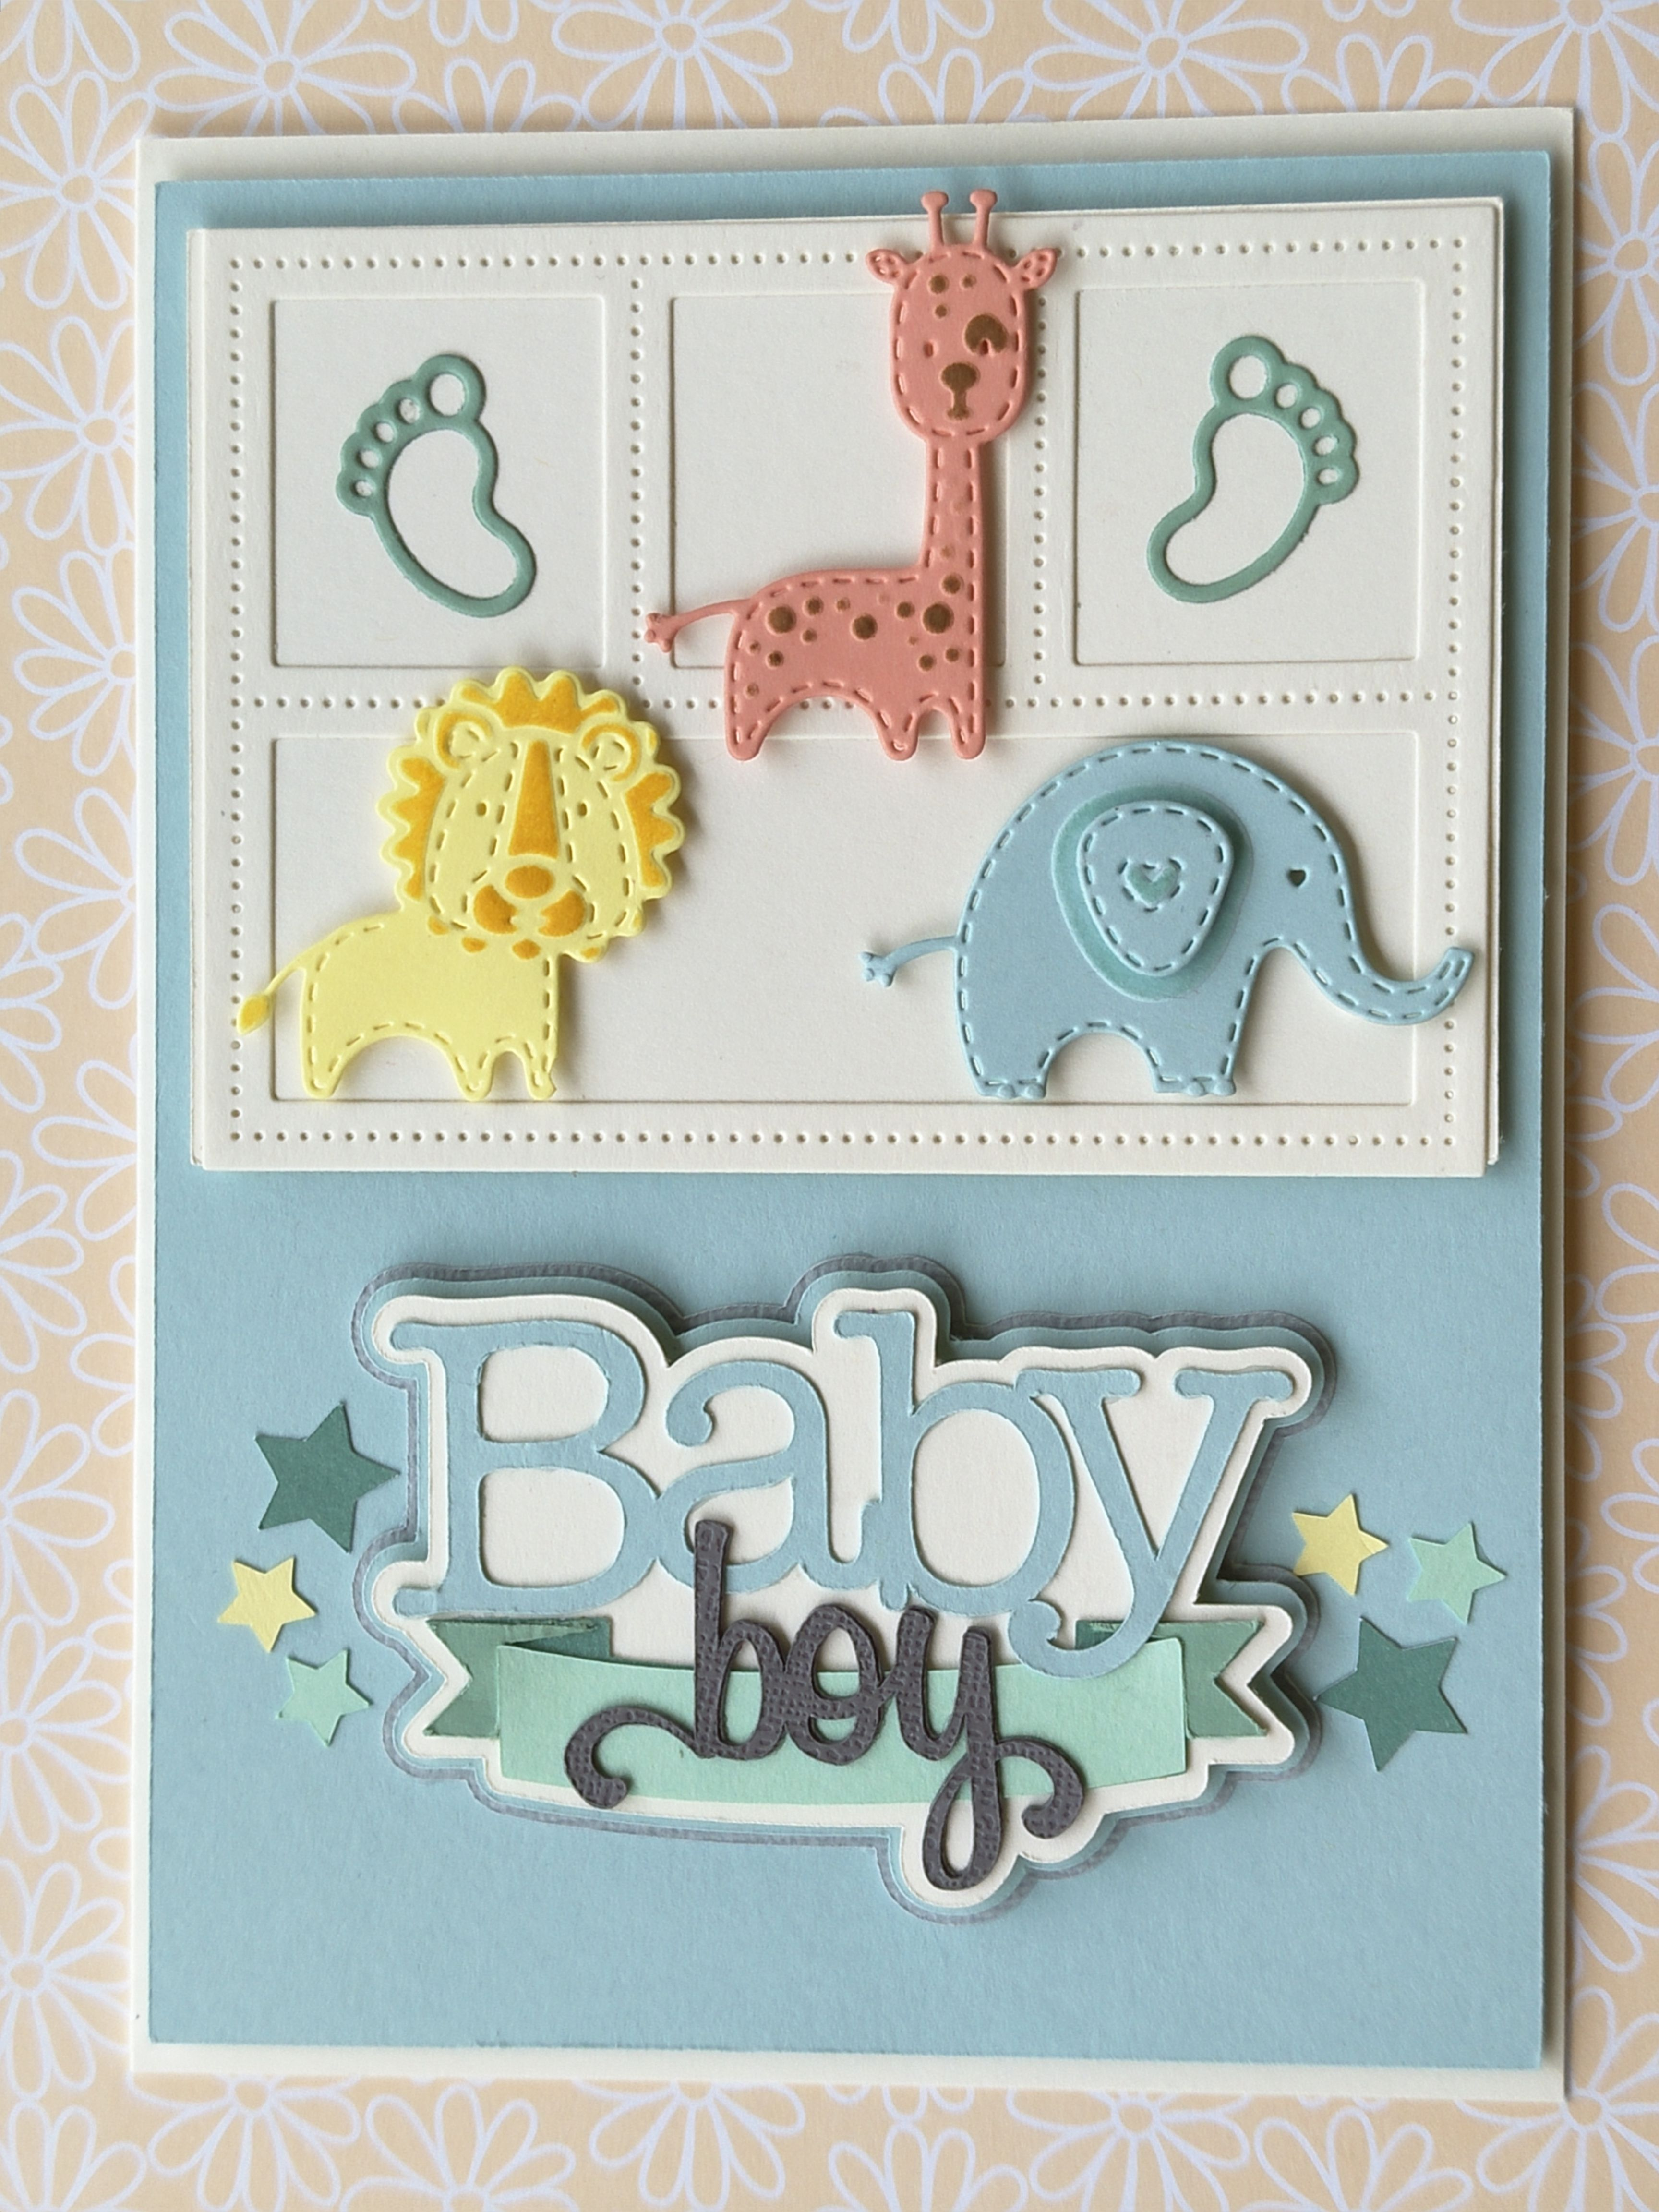 IT/'S A BOY baby title die cuts scrapbook cards